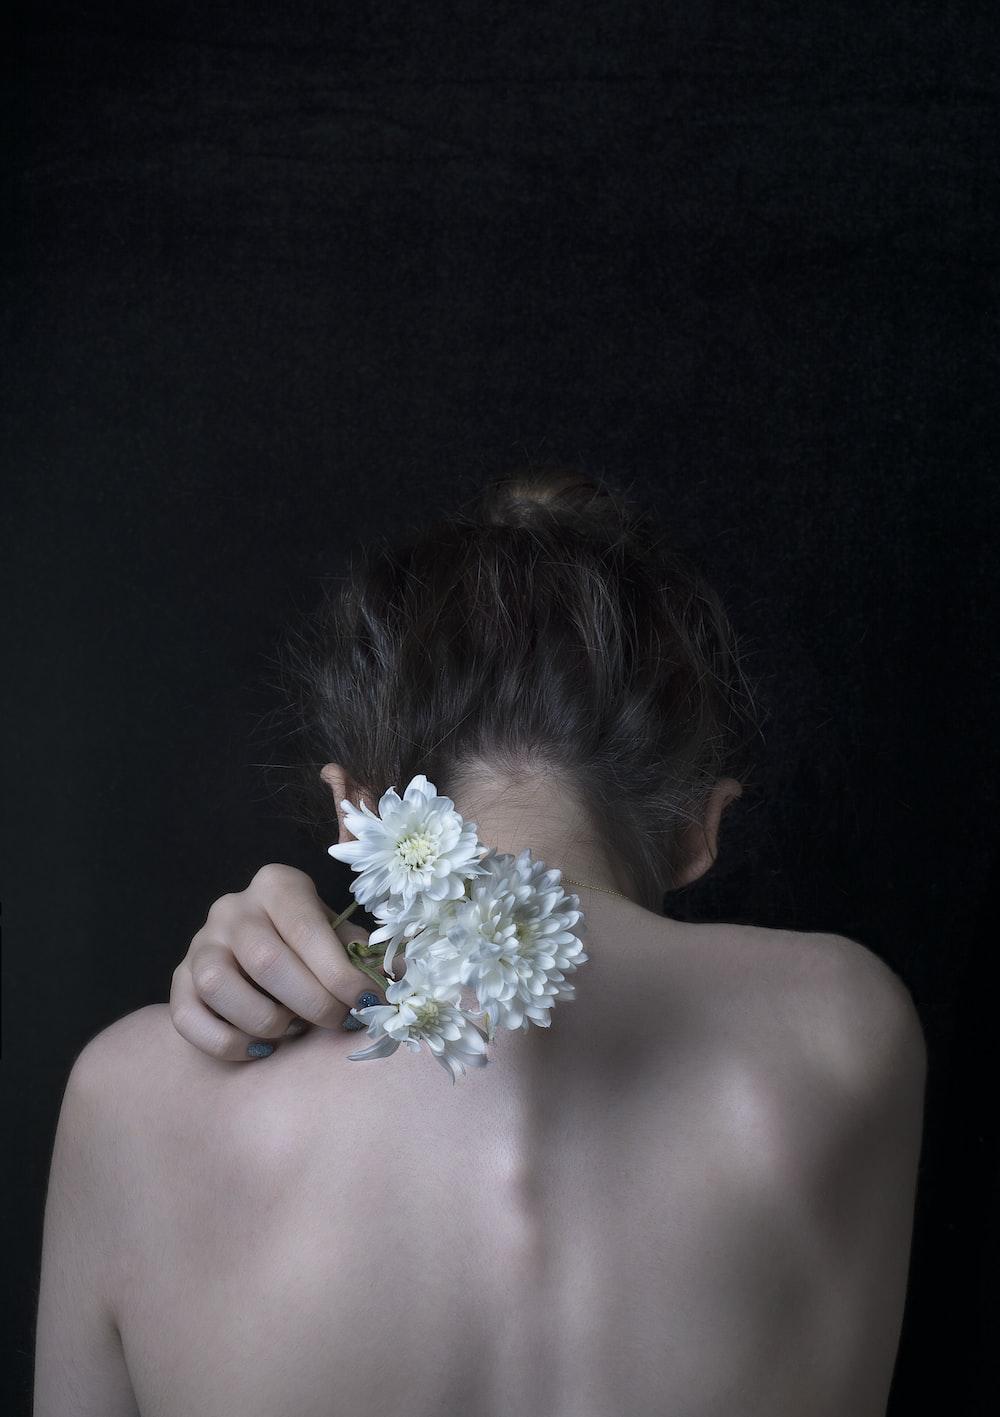 woman holding flower